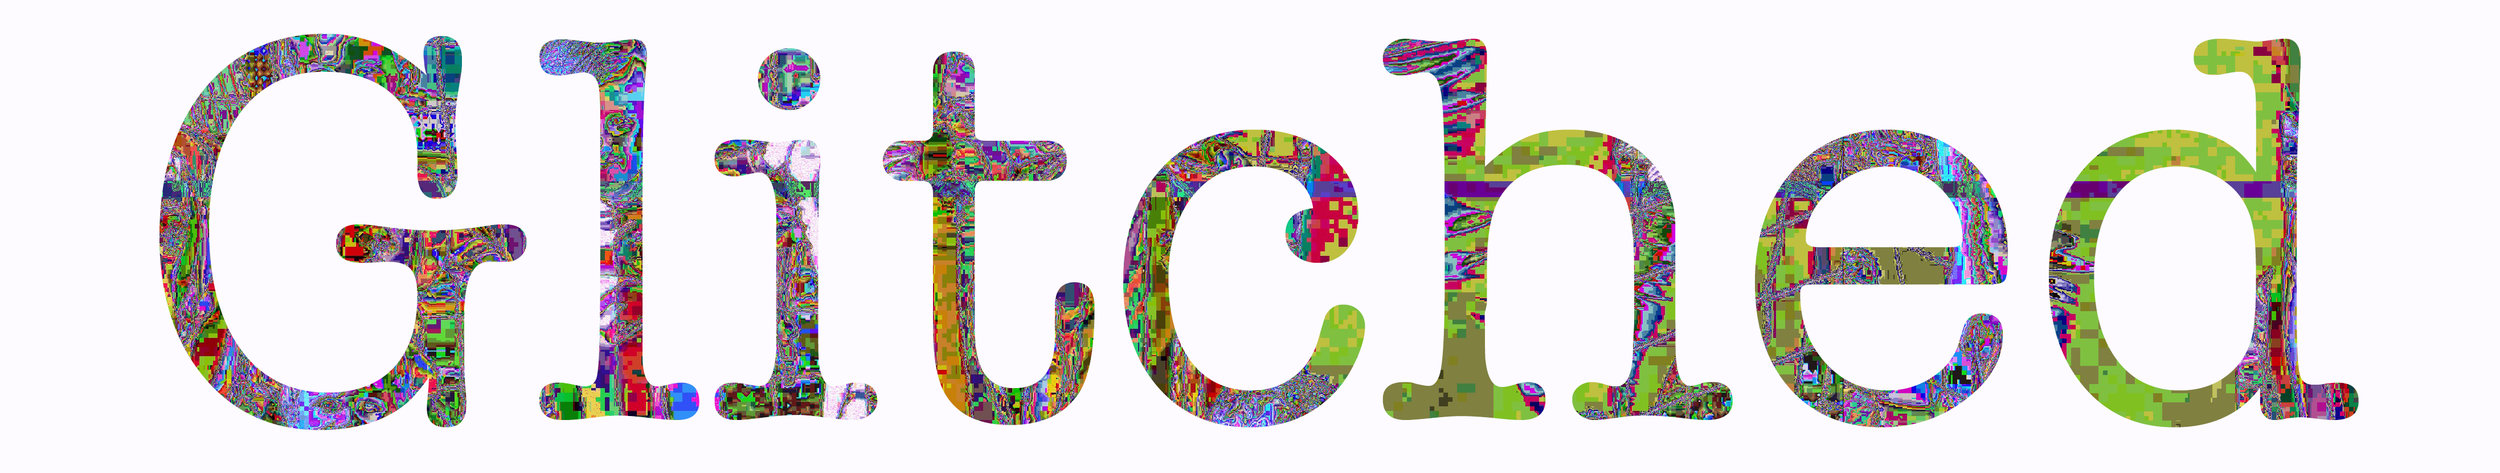 Glitched logo.jpg